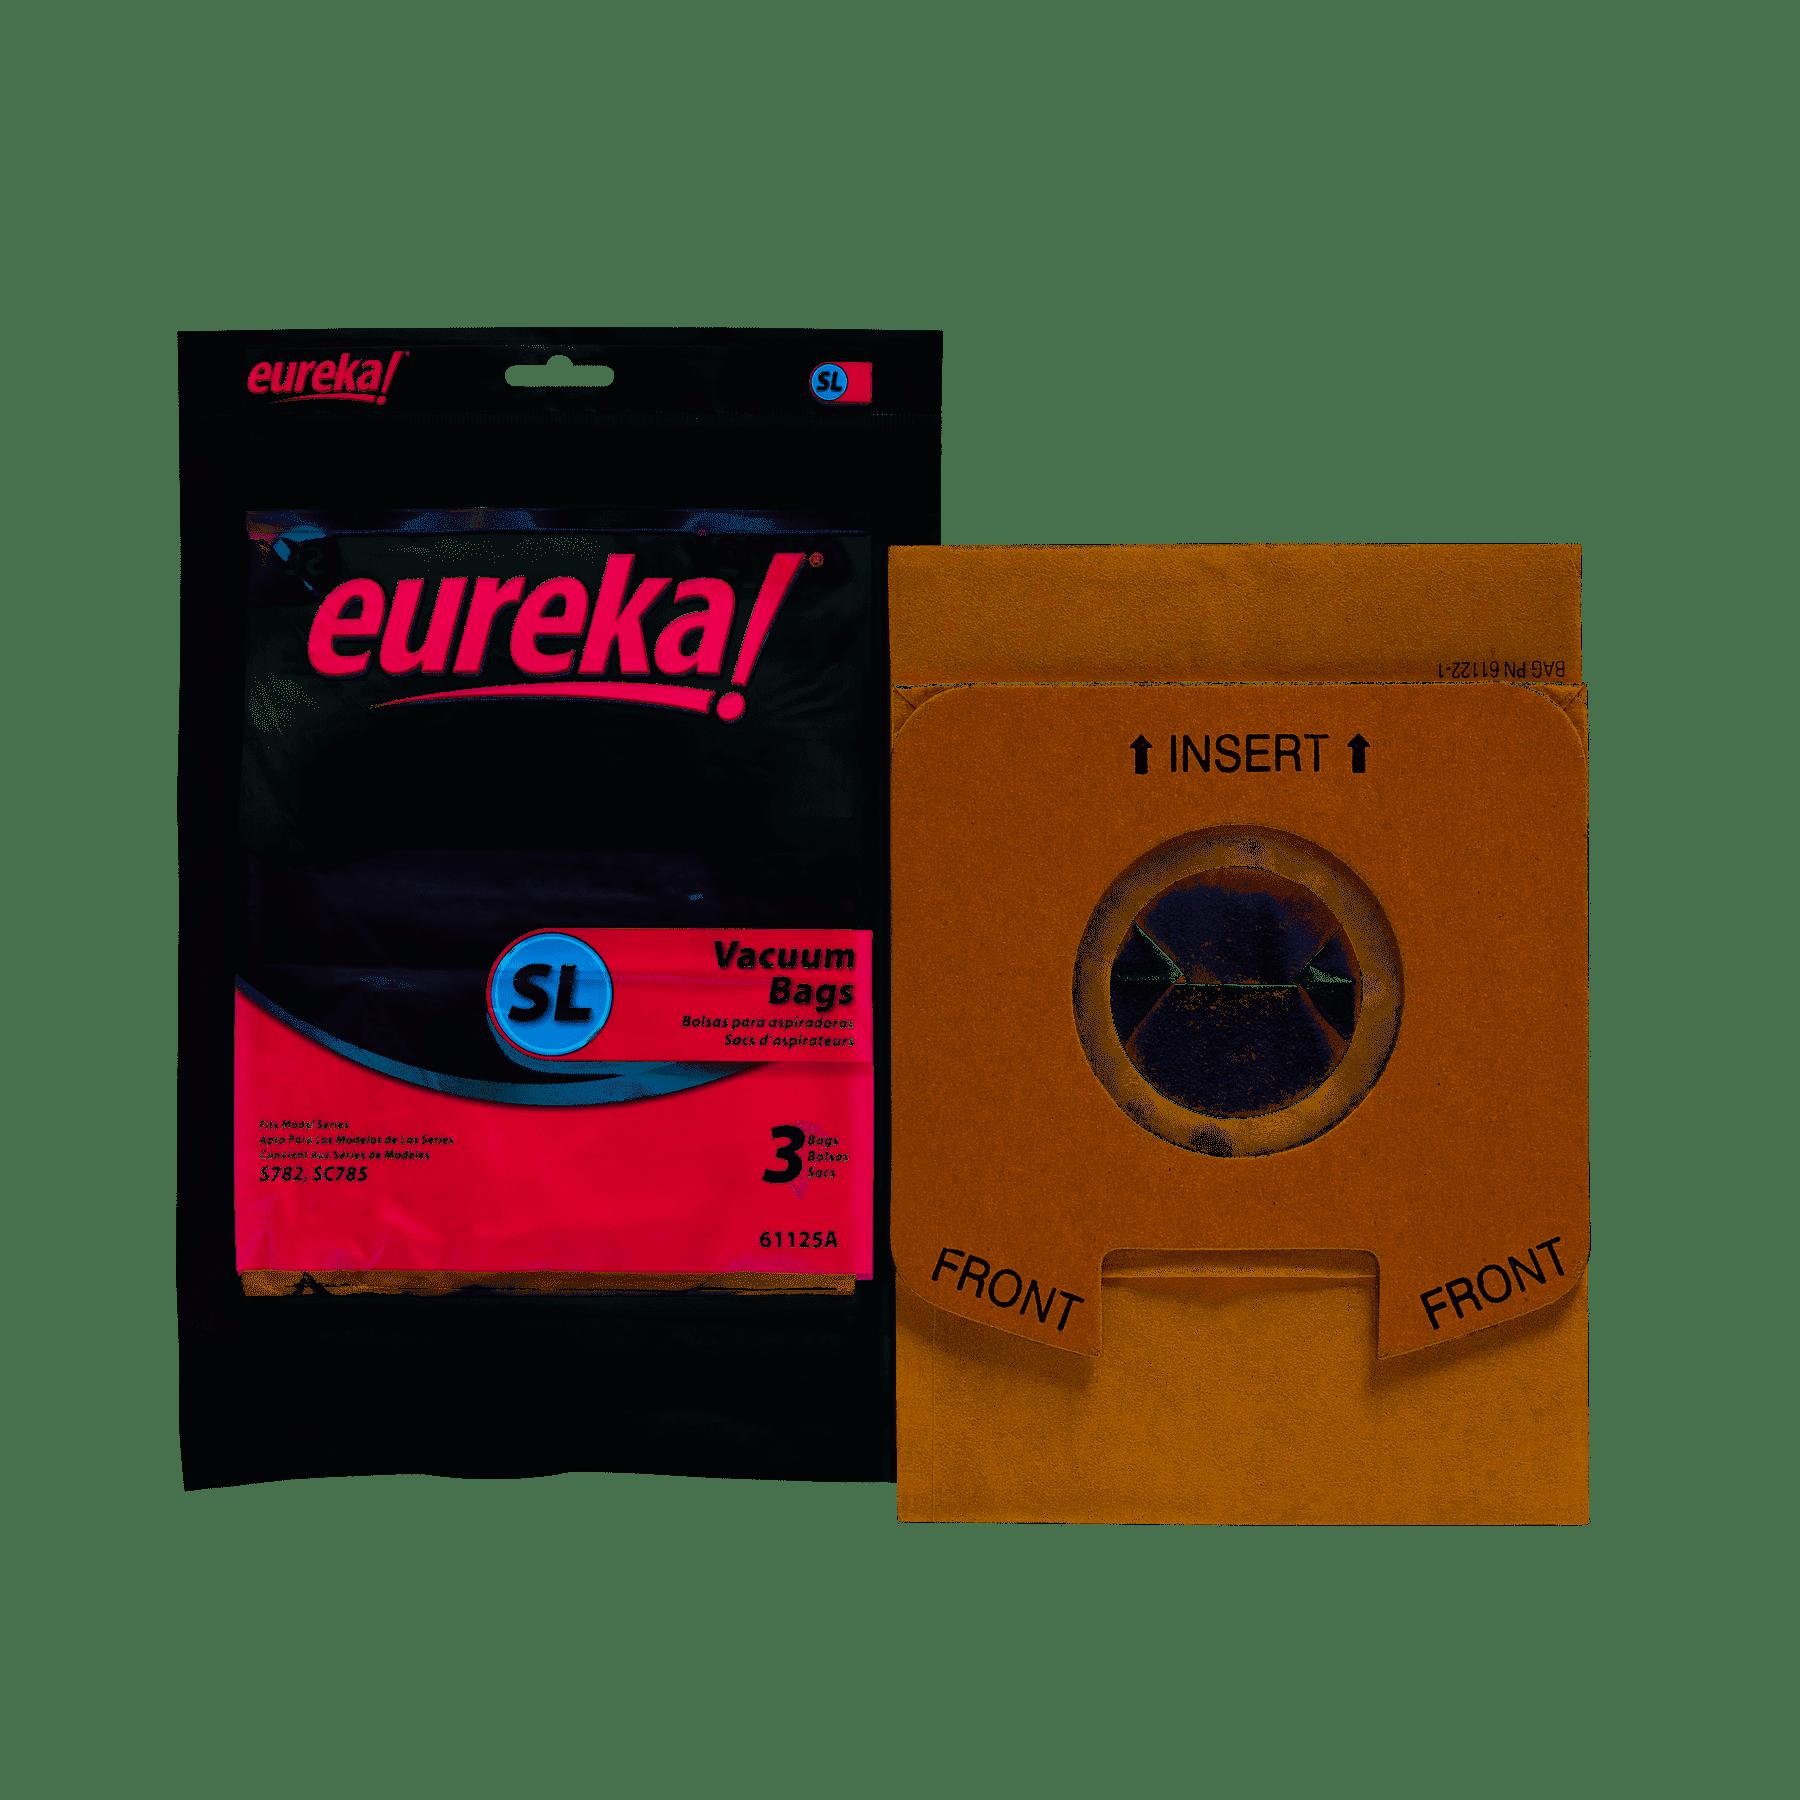 Eureka SL Bags